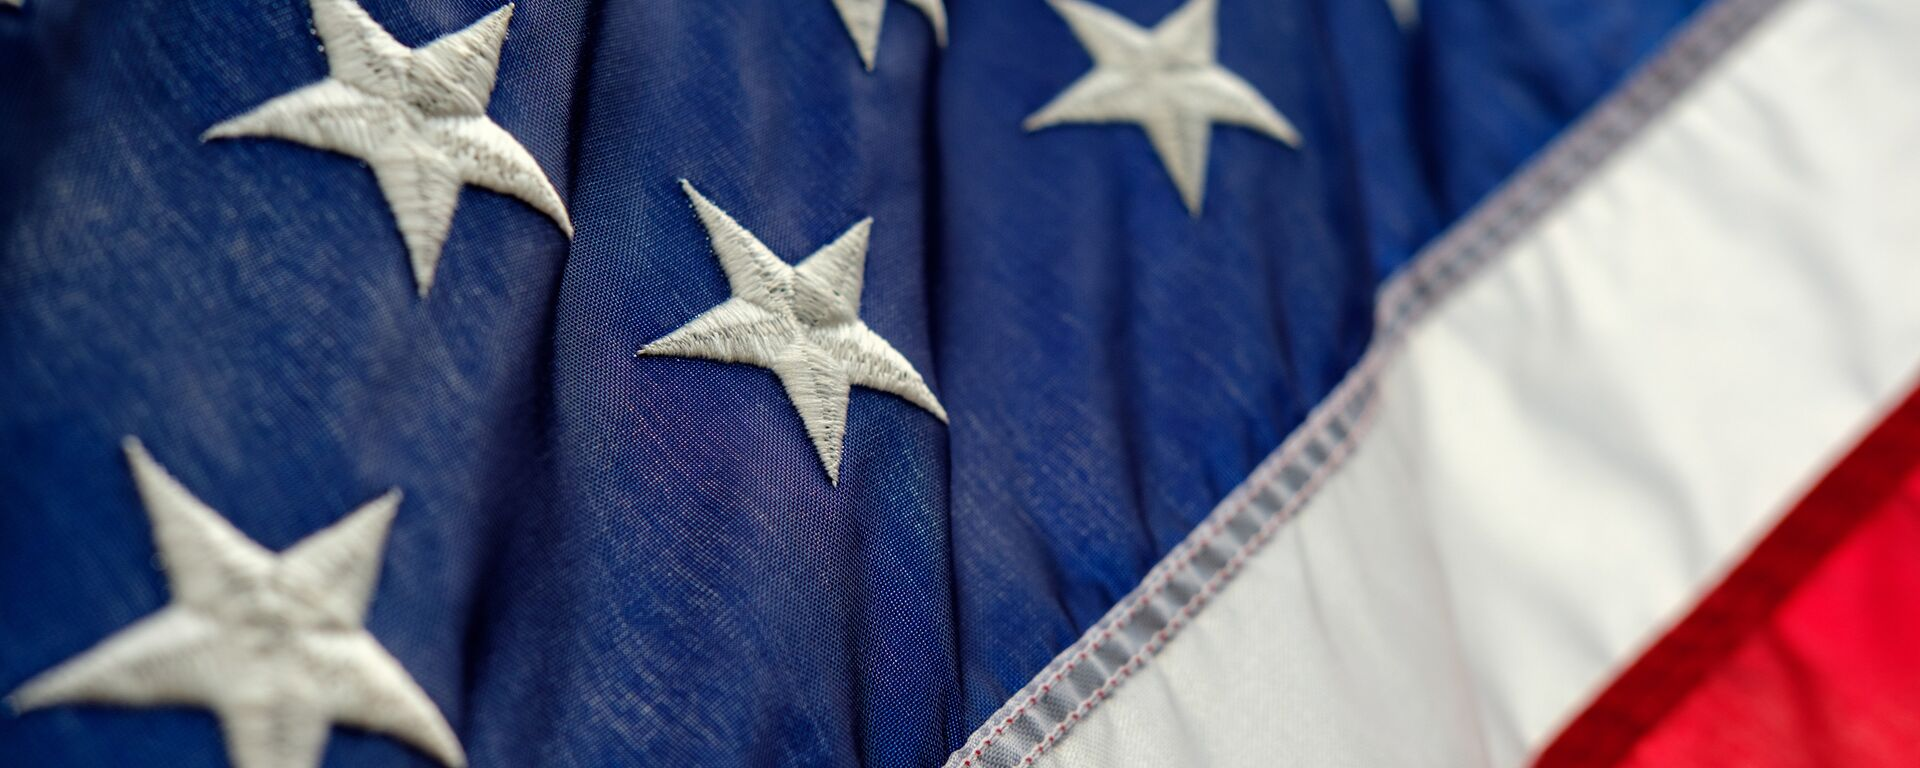 Bandera de EEUU - Sputnik Mundo, 1920, 09.03.2021